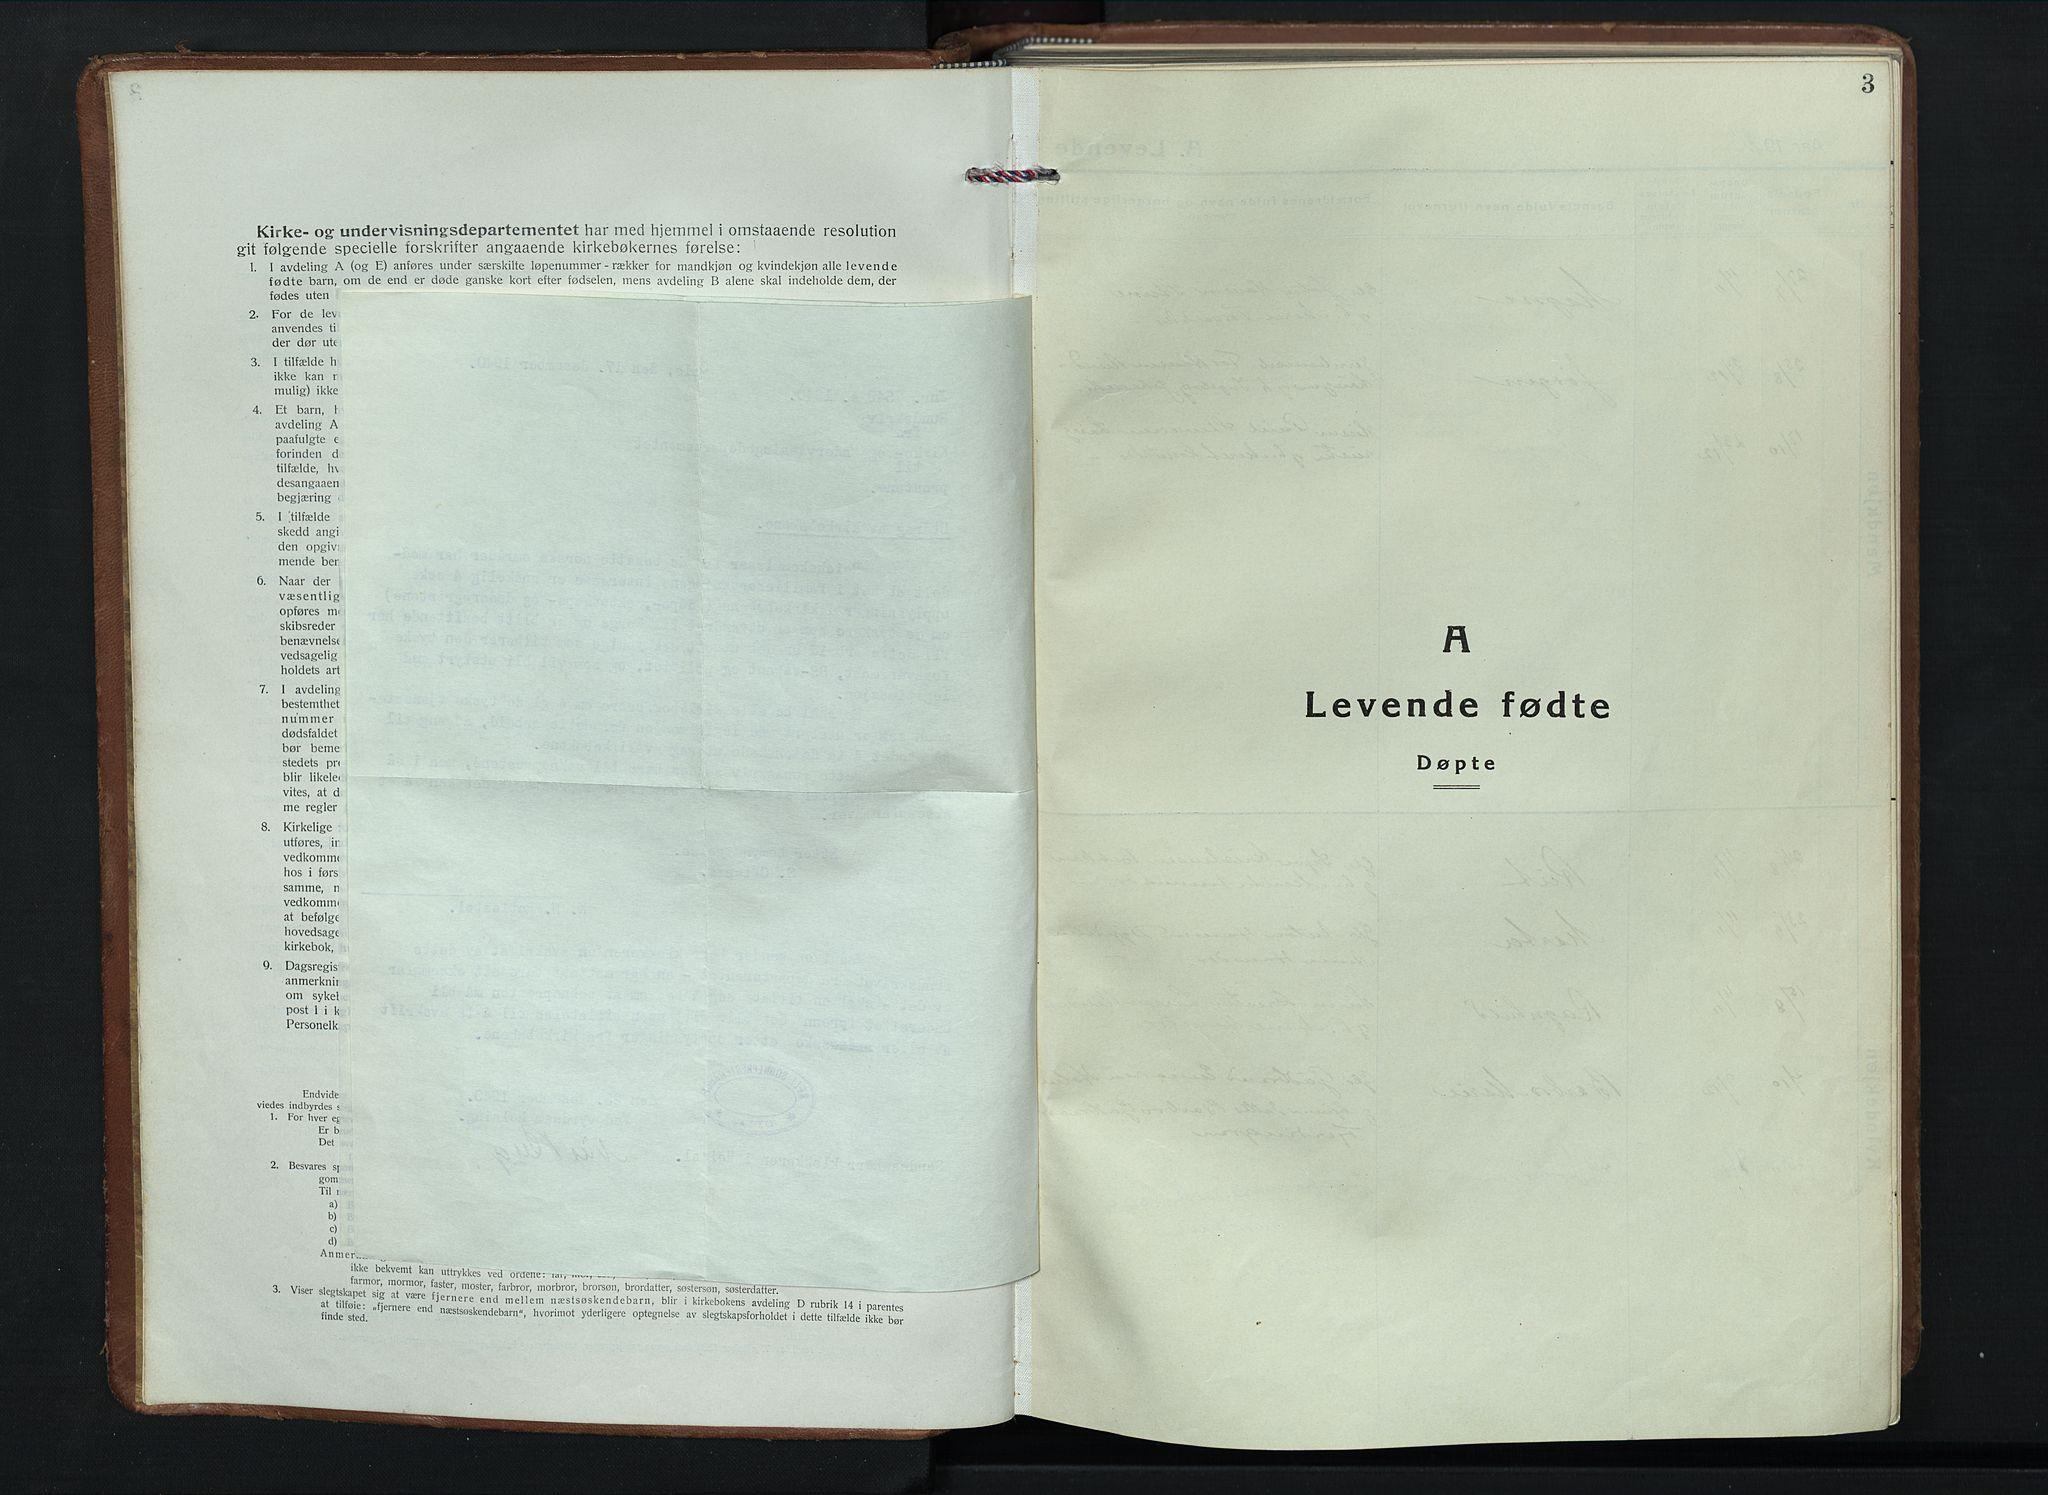 SAH, Sel prestekontor, Klokkerbok nr. 6, 1923-1953, s. 3